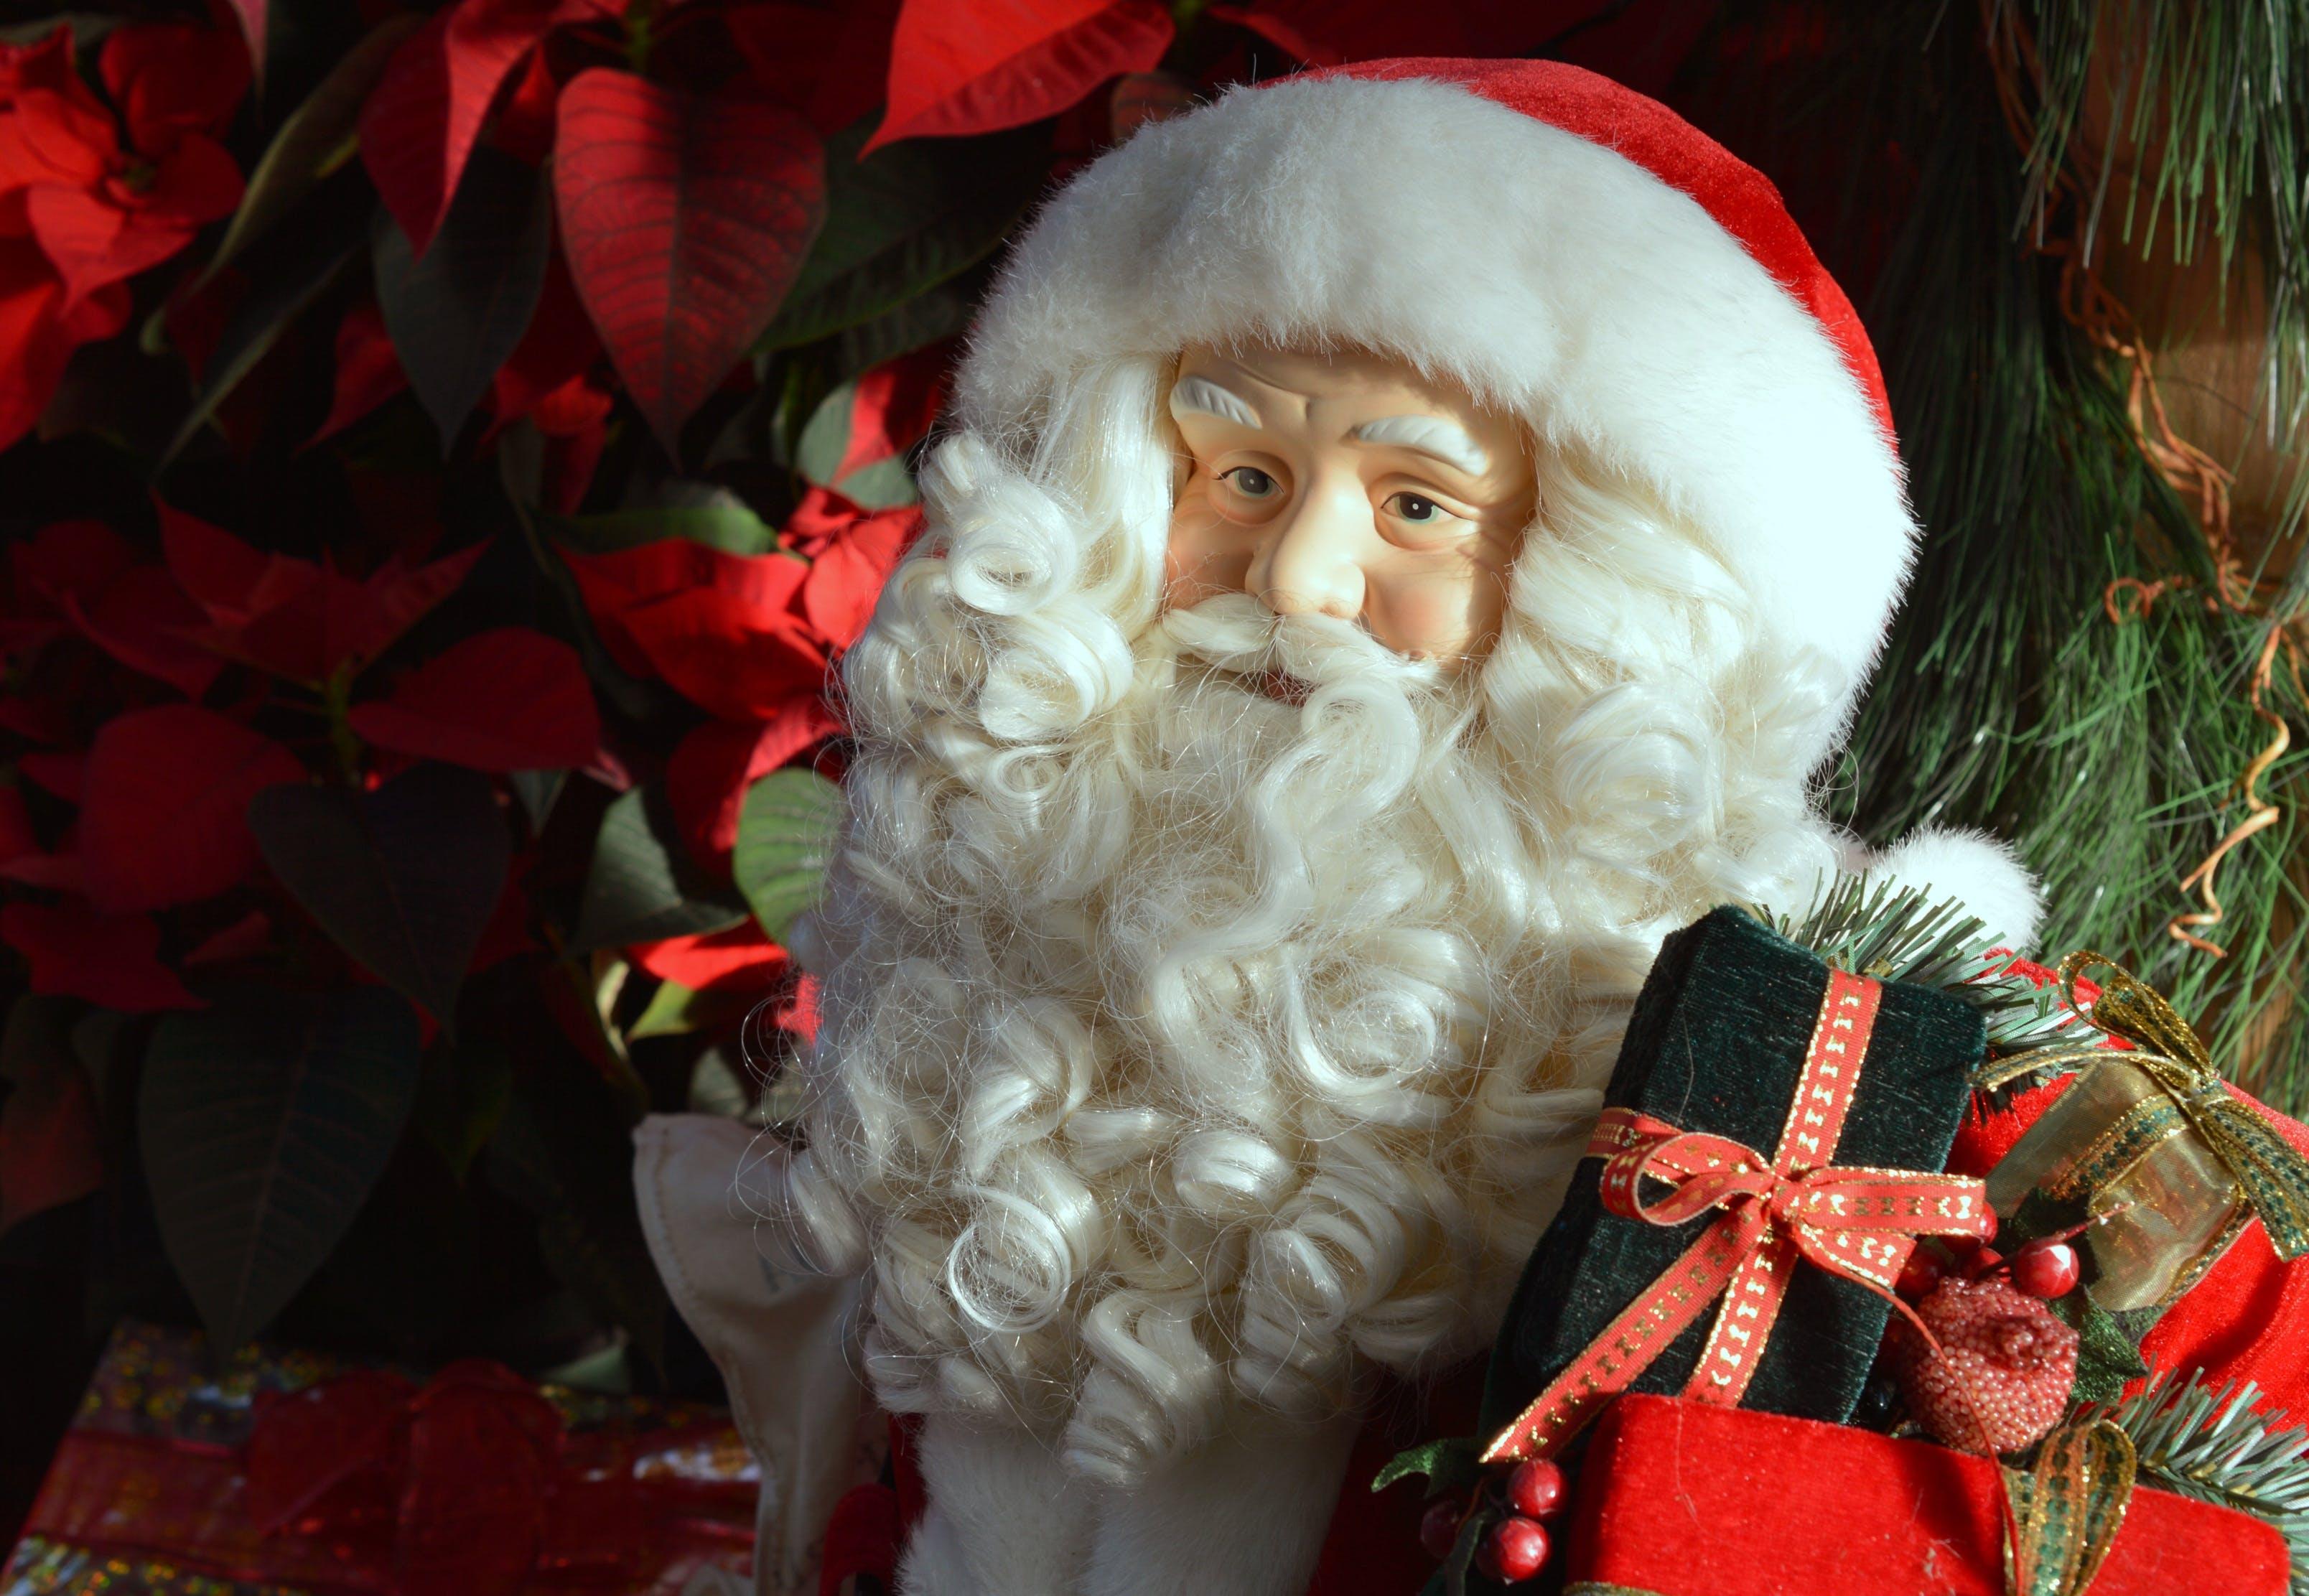 Free stock photo of holiday, festive, winter, christmas